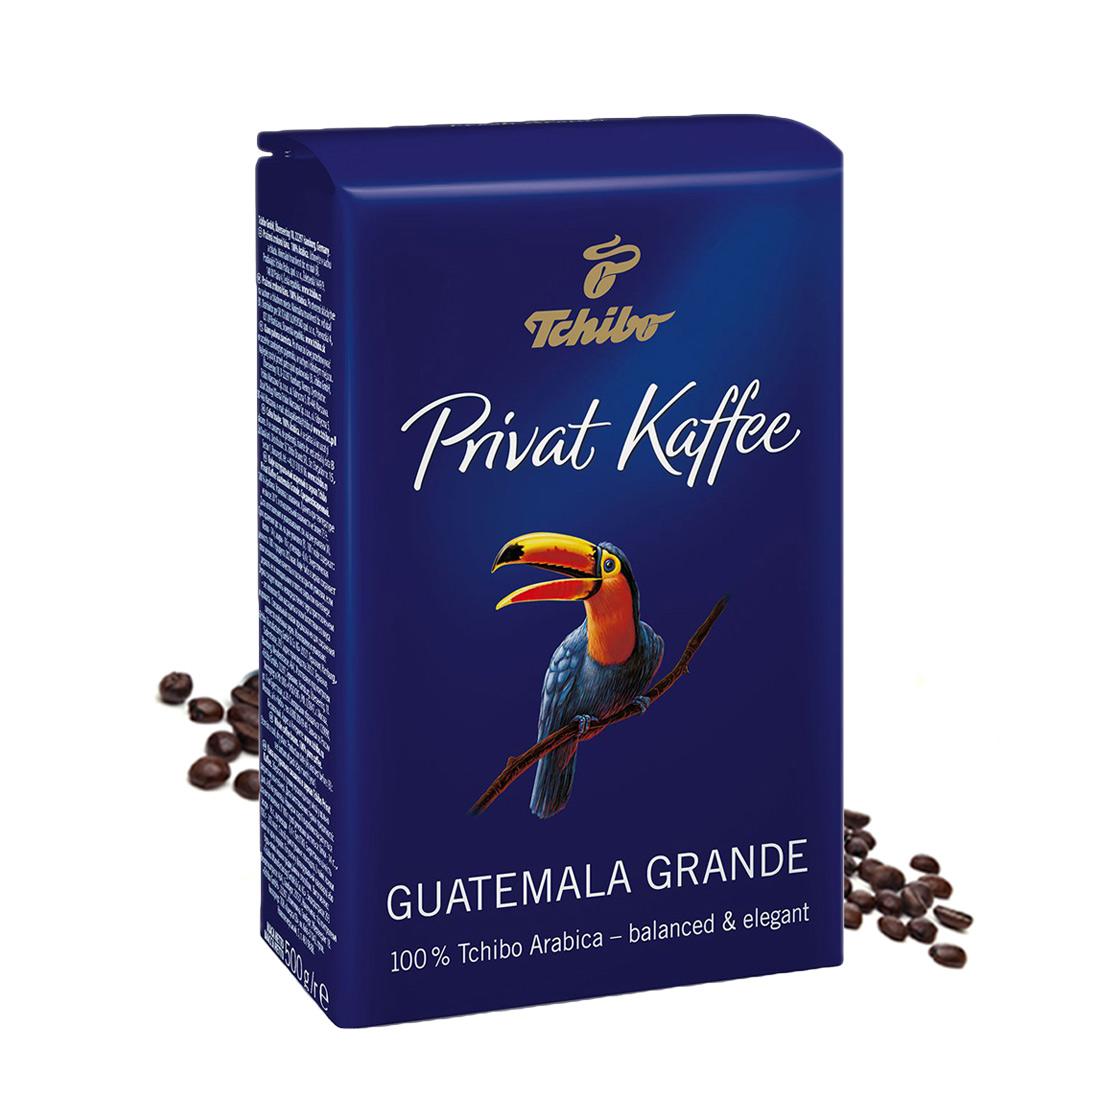 Tchibo Privat Kaffee Guatemala Grande cafea boabe 500g